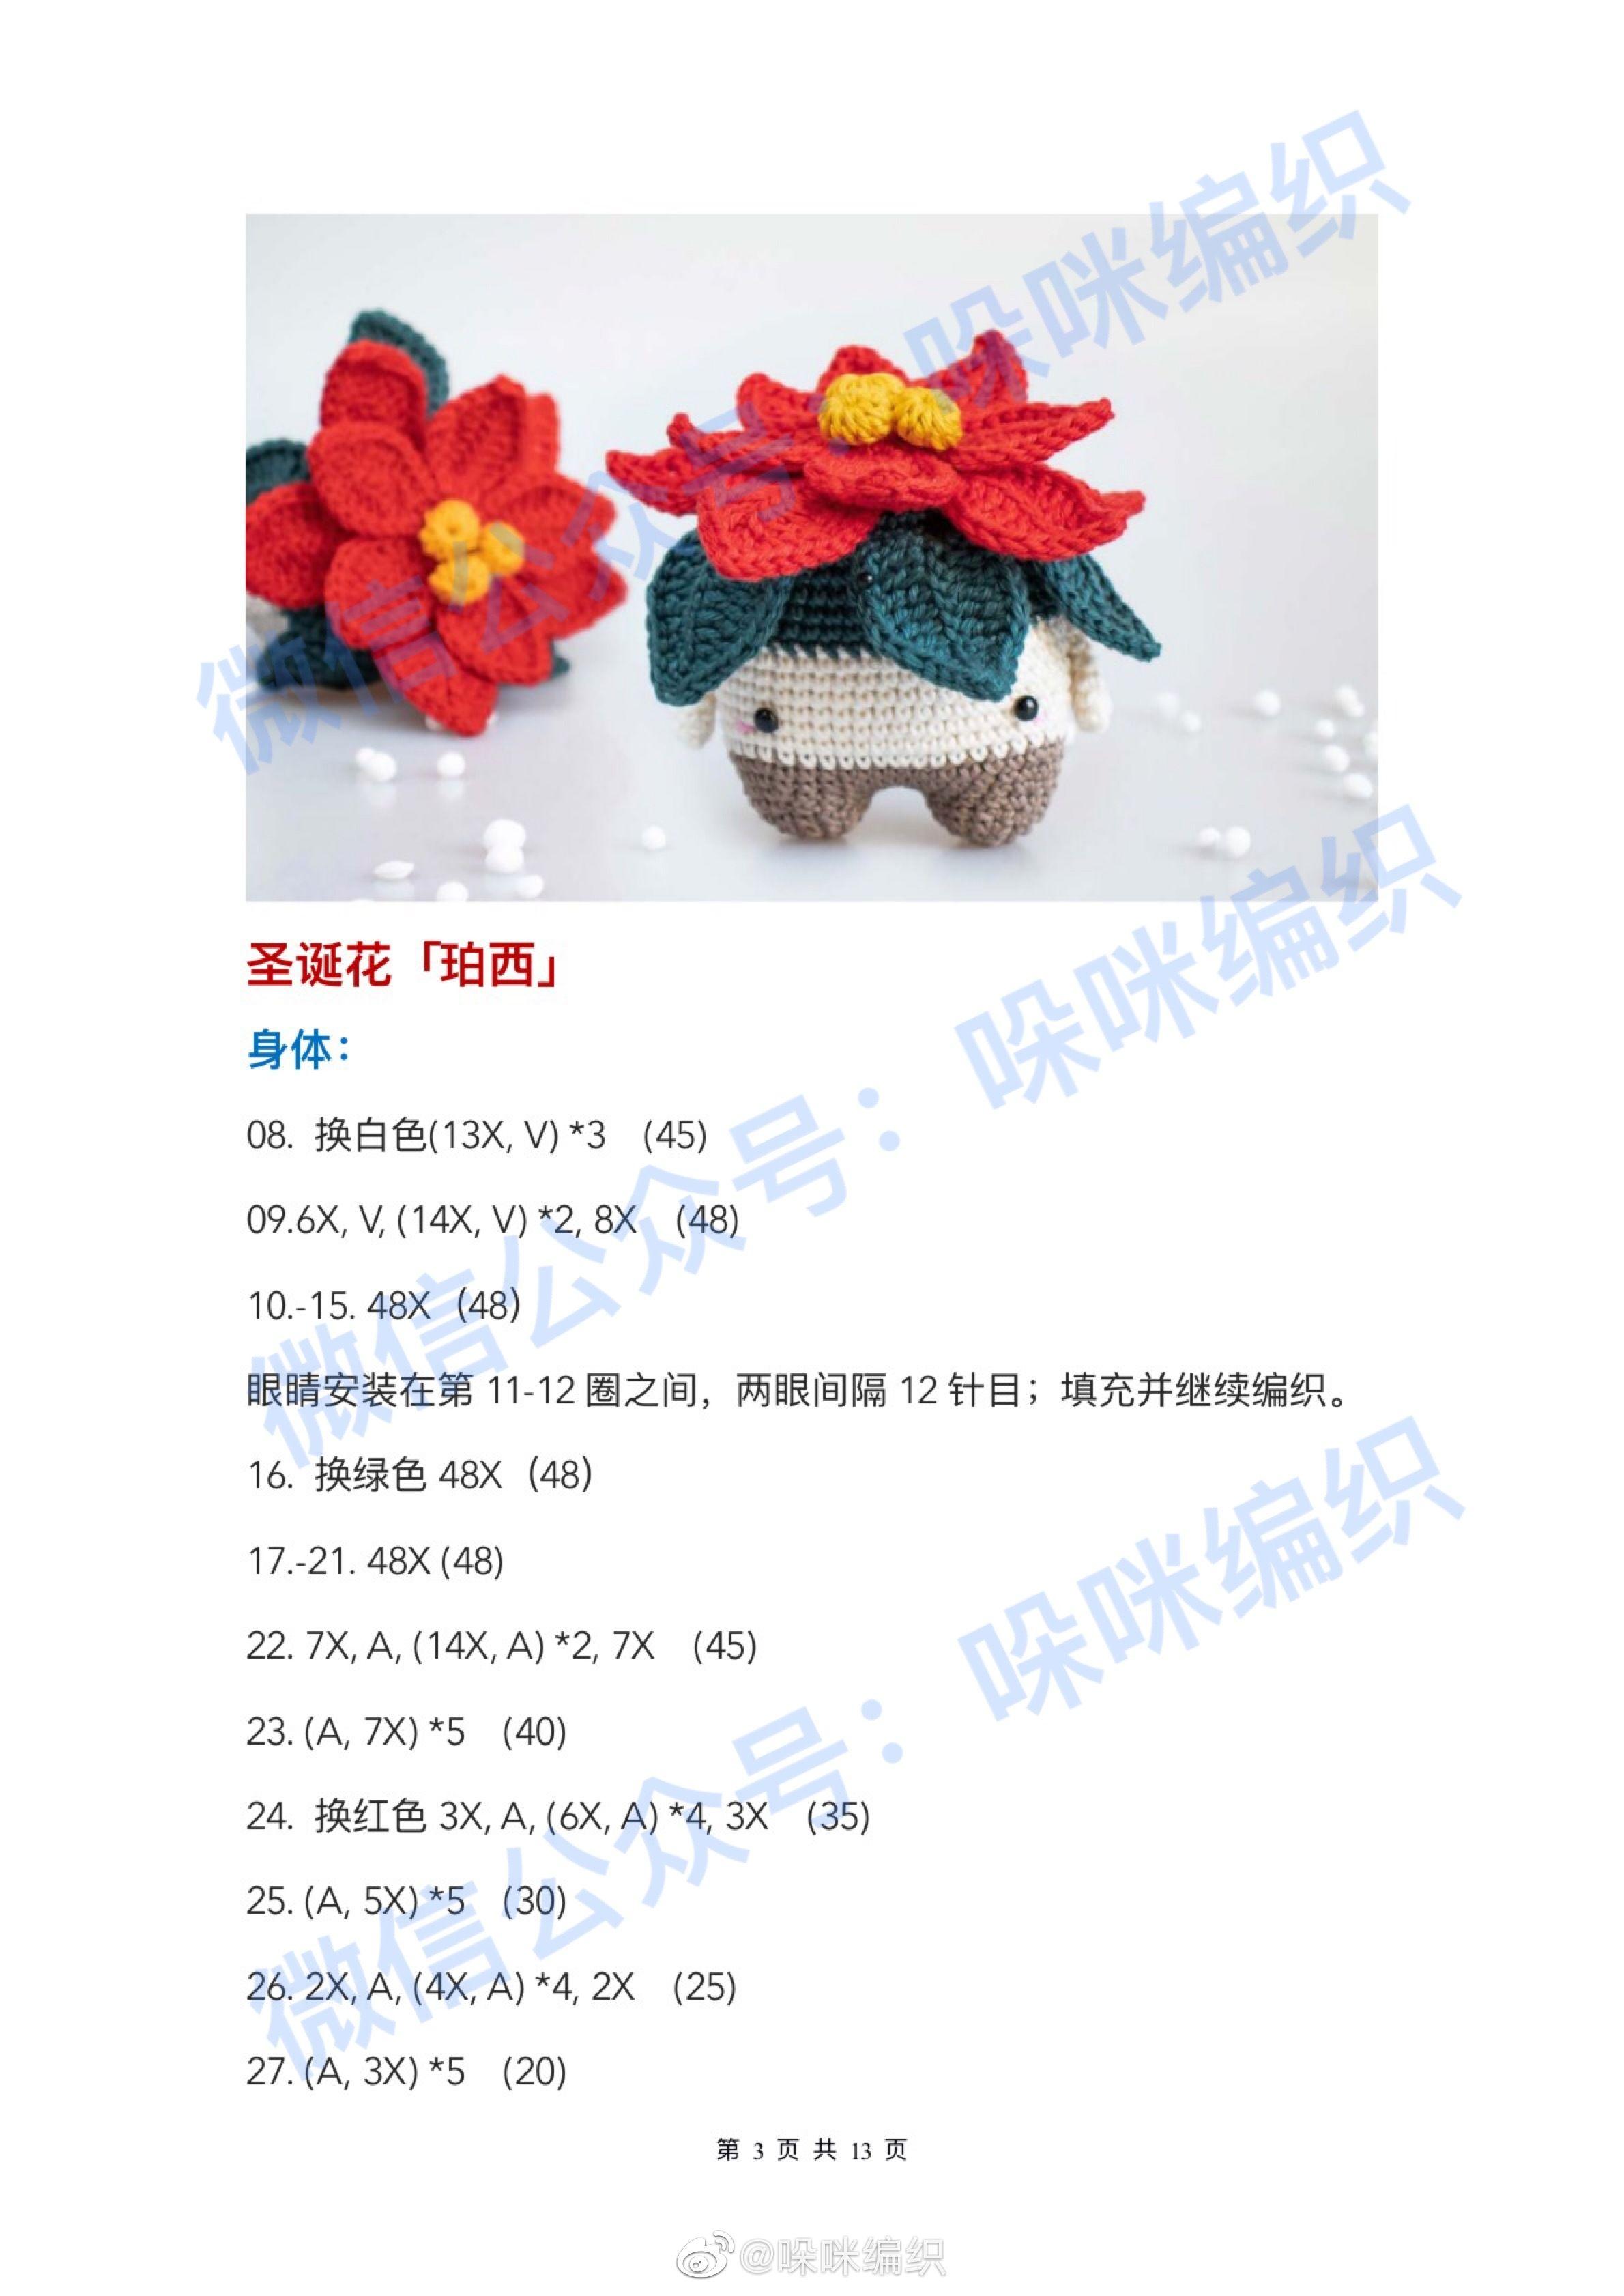 Jossa Handmade - [微博团钩- Weibo Crochet Activity] - 幽灵公主 ... | 3364x2380